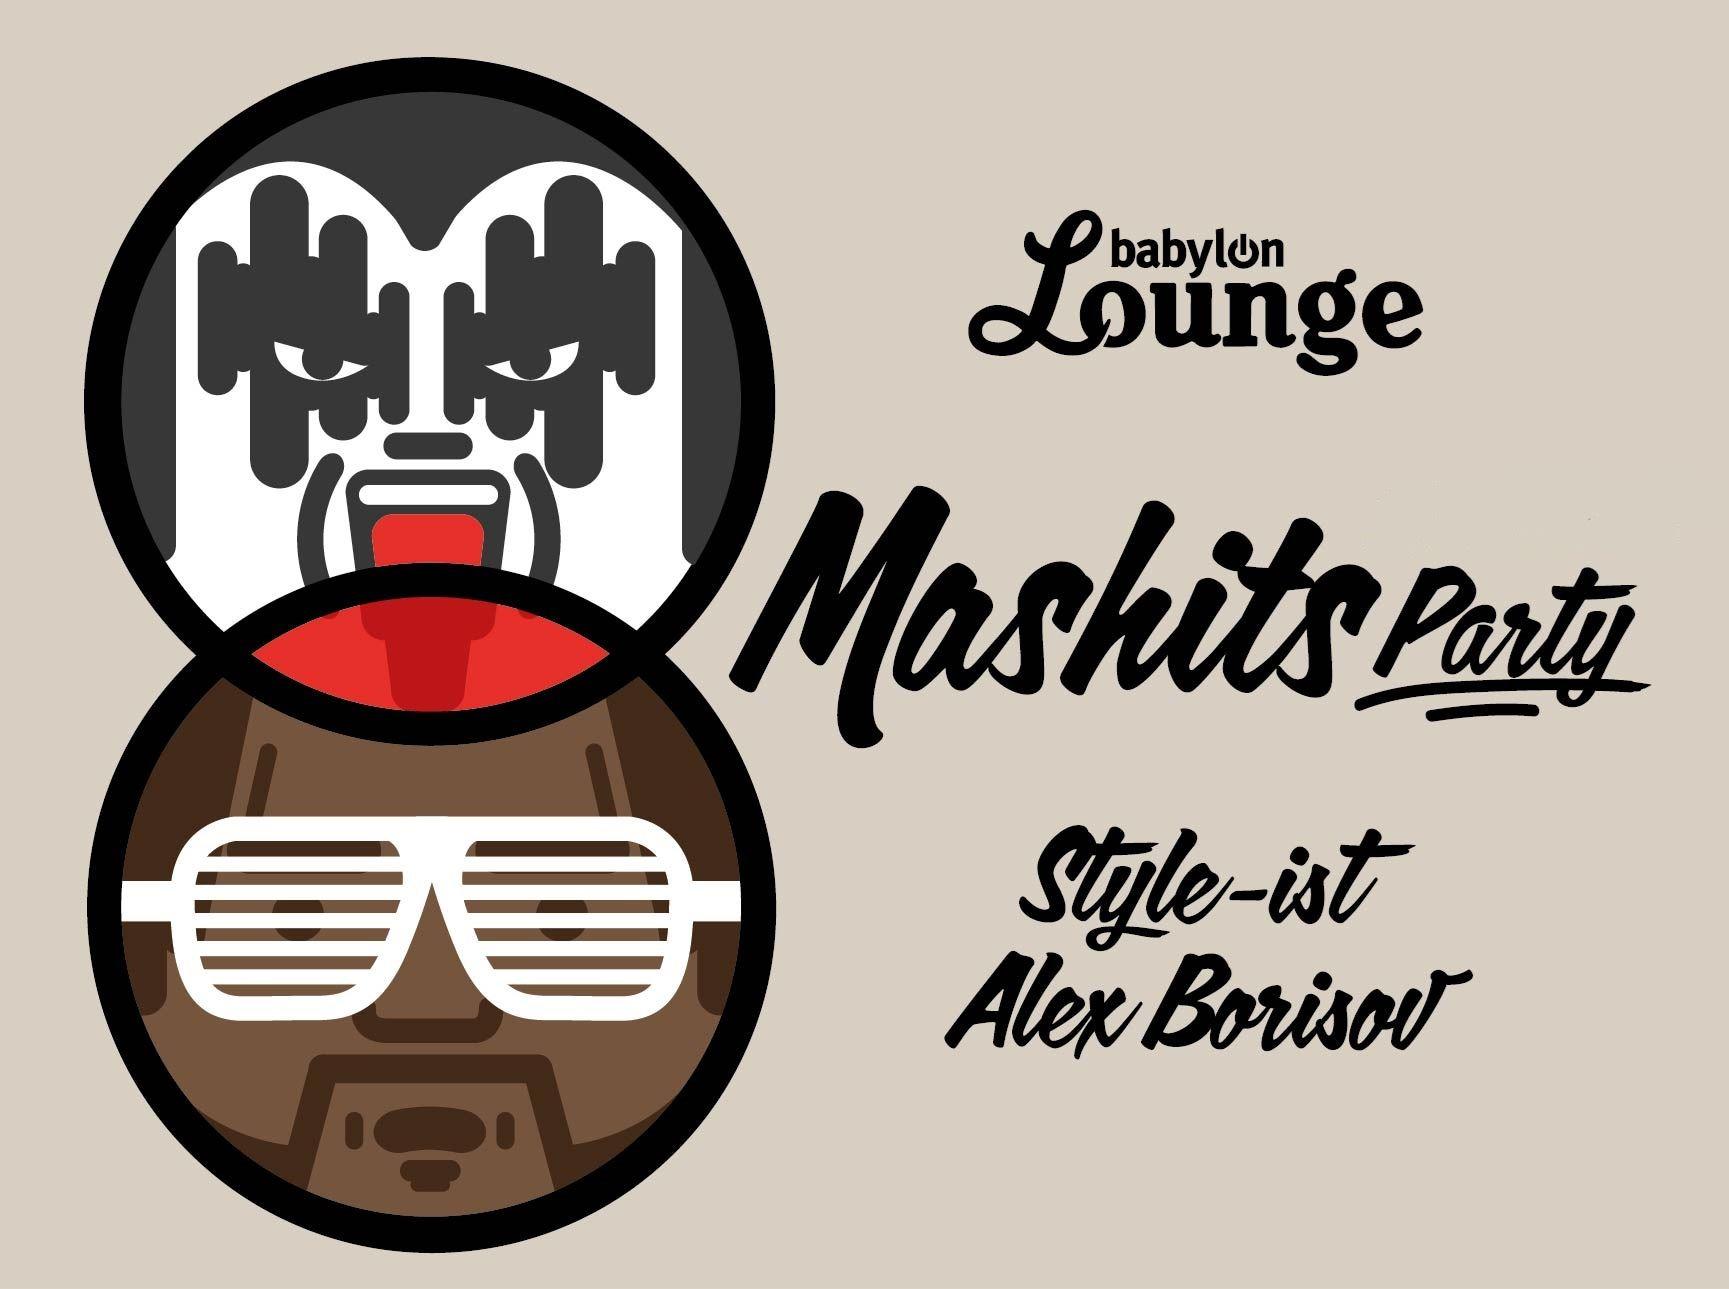 Mashits Party